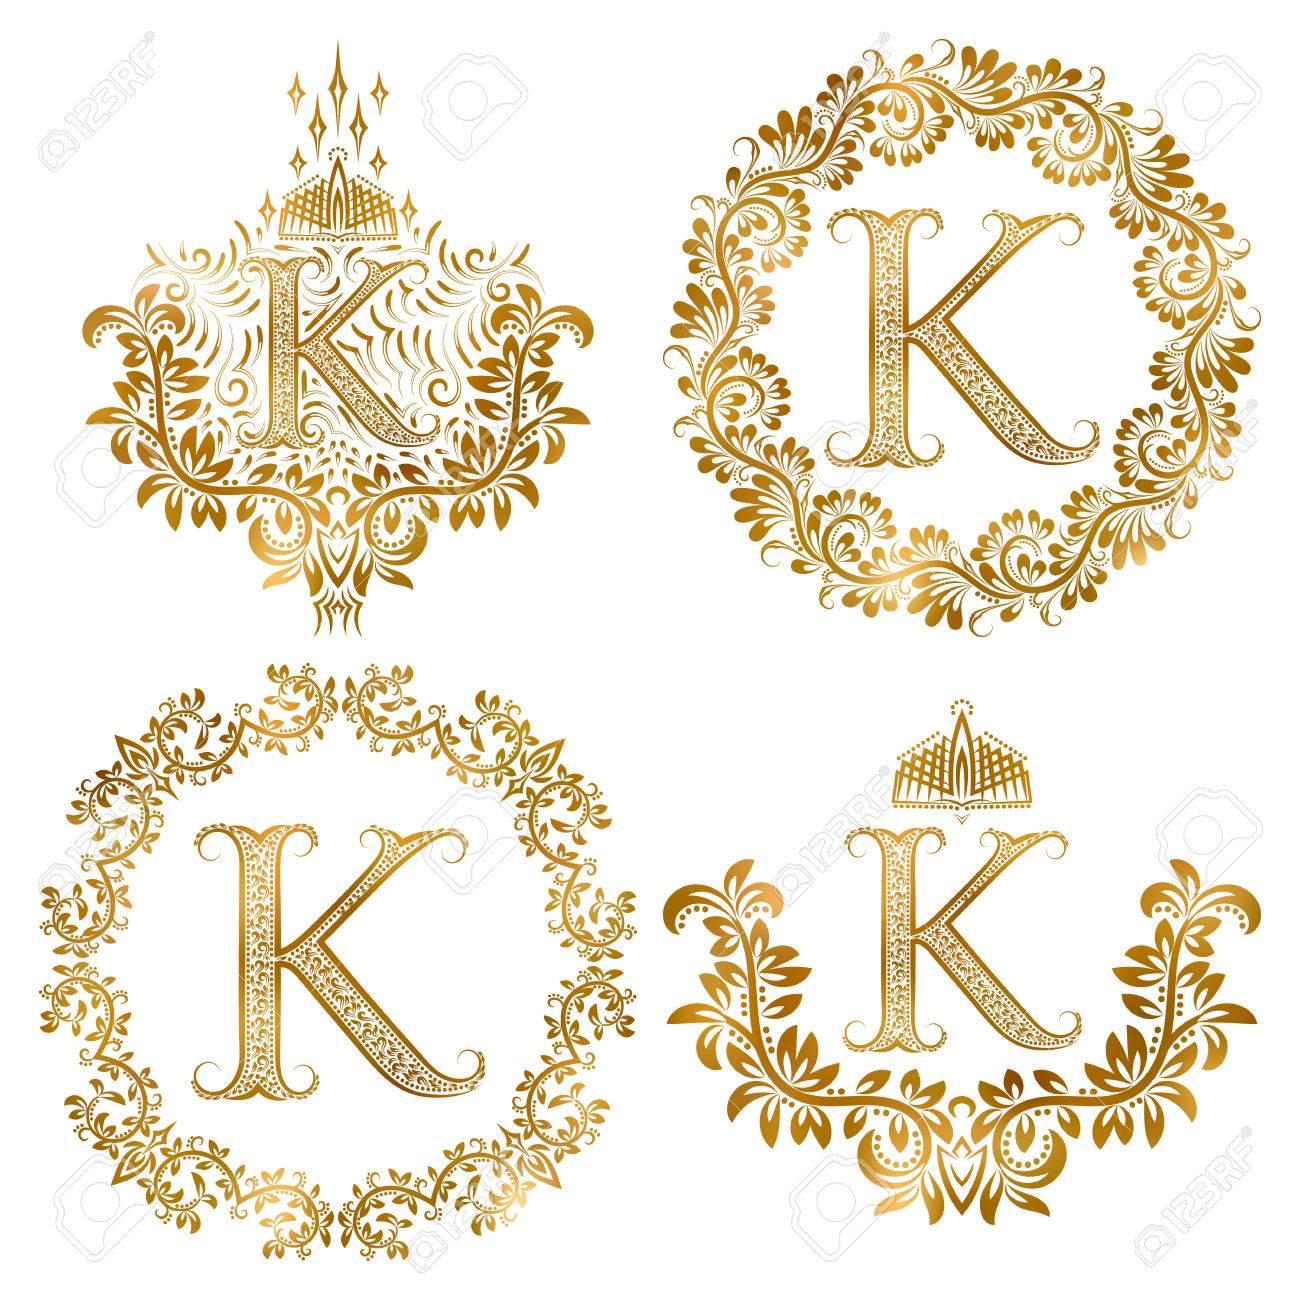 Or Lettre K Vintage Monogrammes Fixe Monogramme Heraldiques Couches